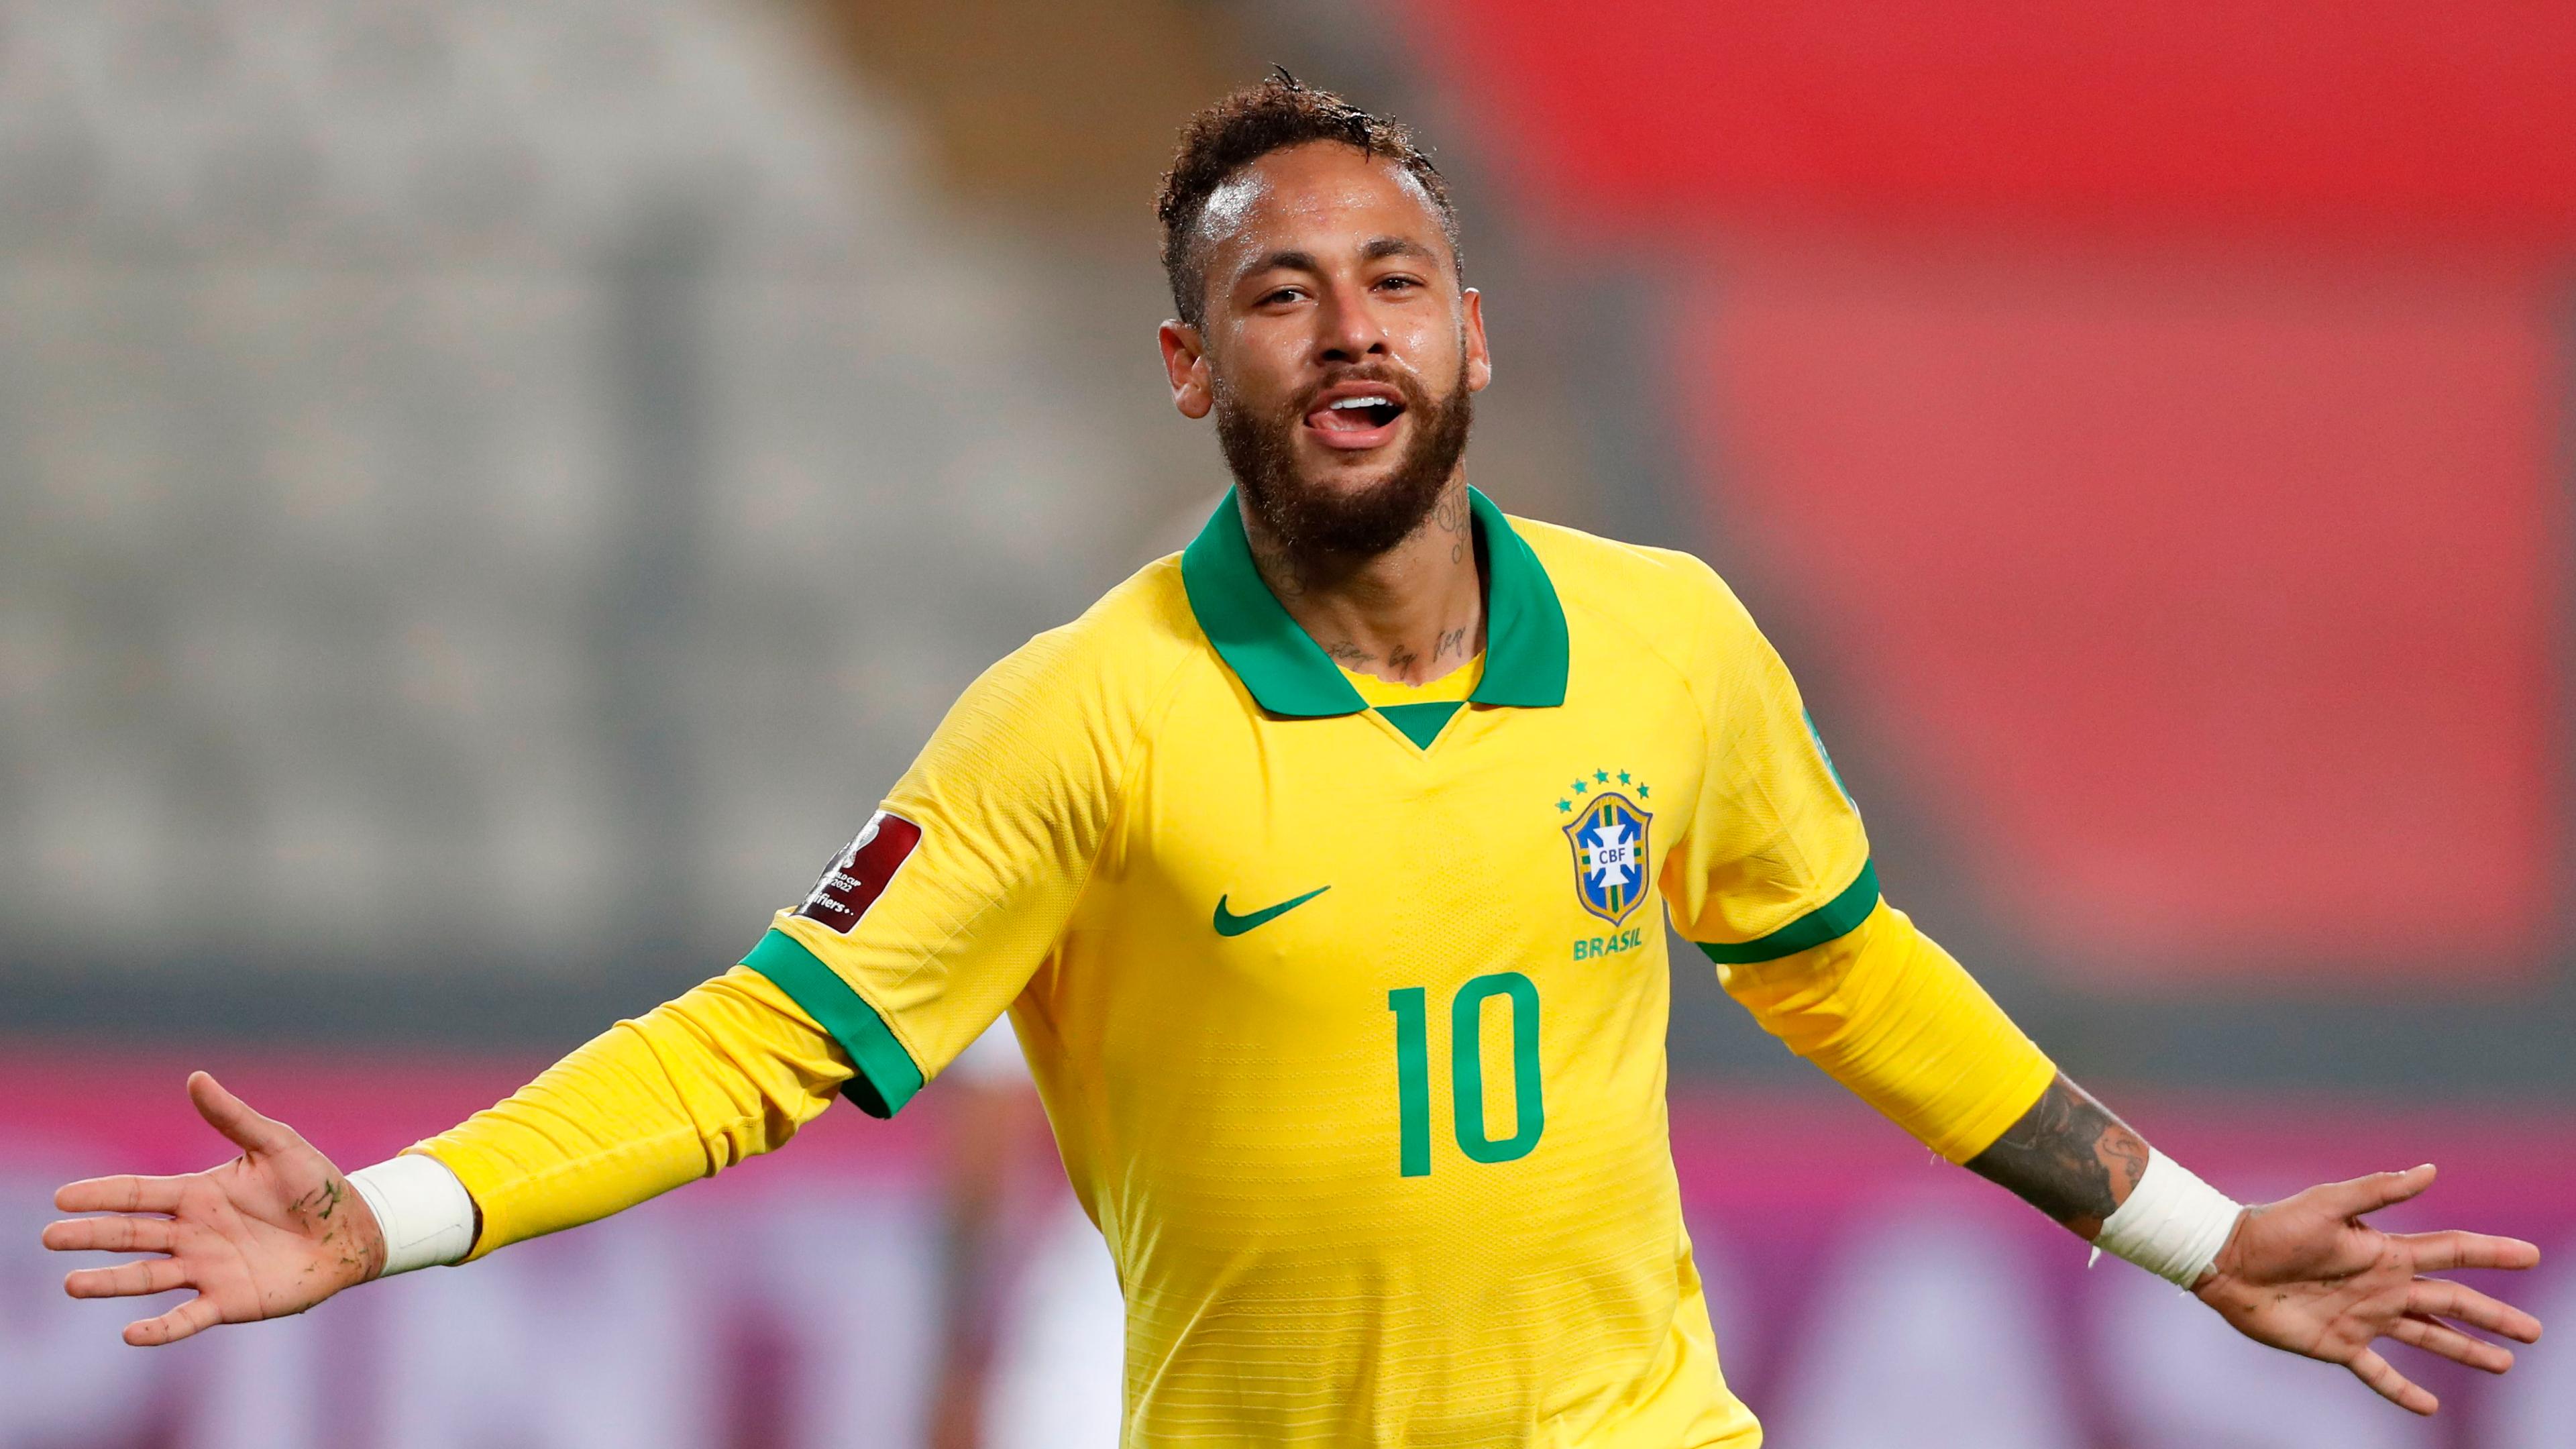 'Neymar is a real clown!' - Zambrano slams Brazil star for diving in Peru clash